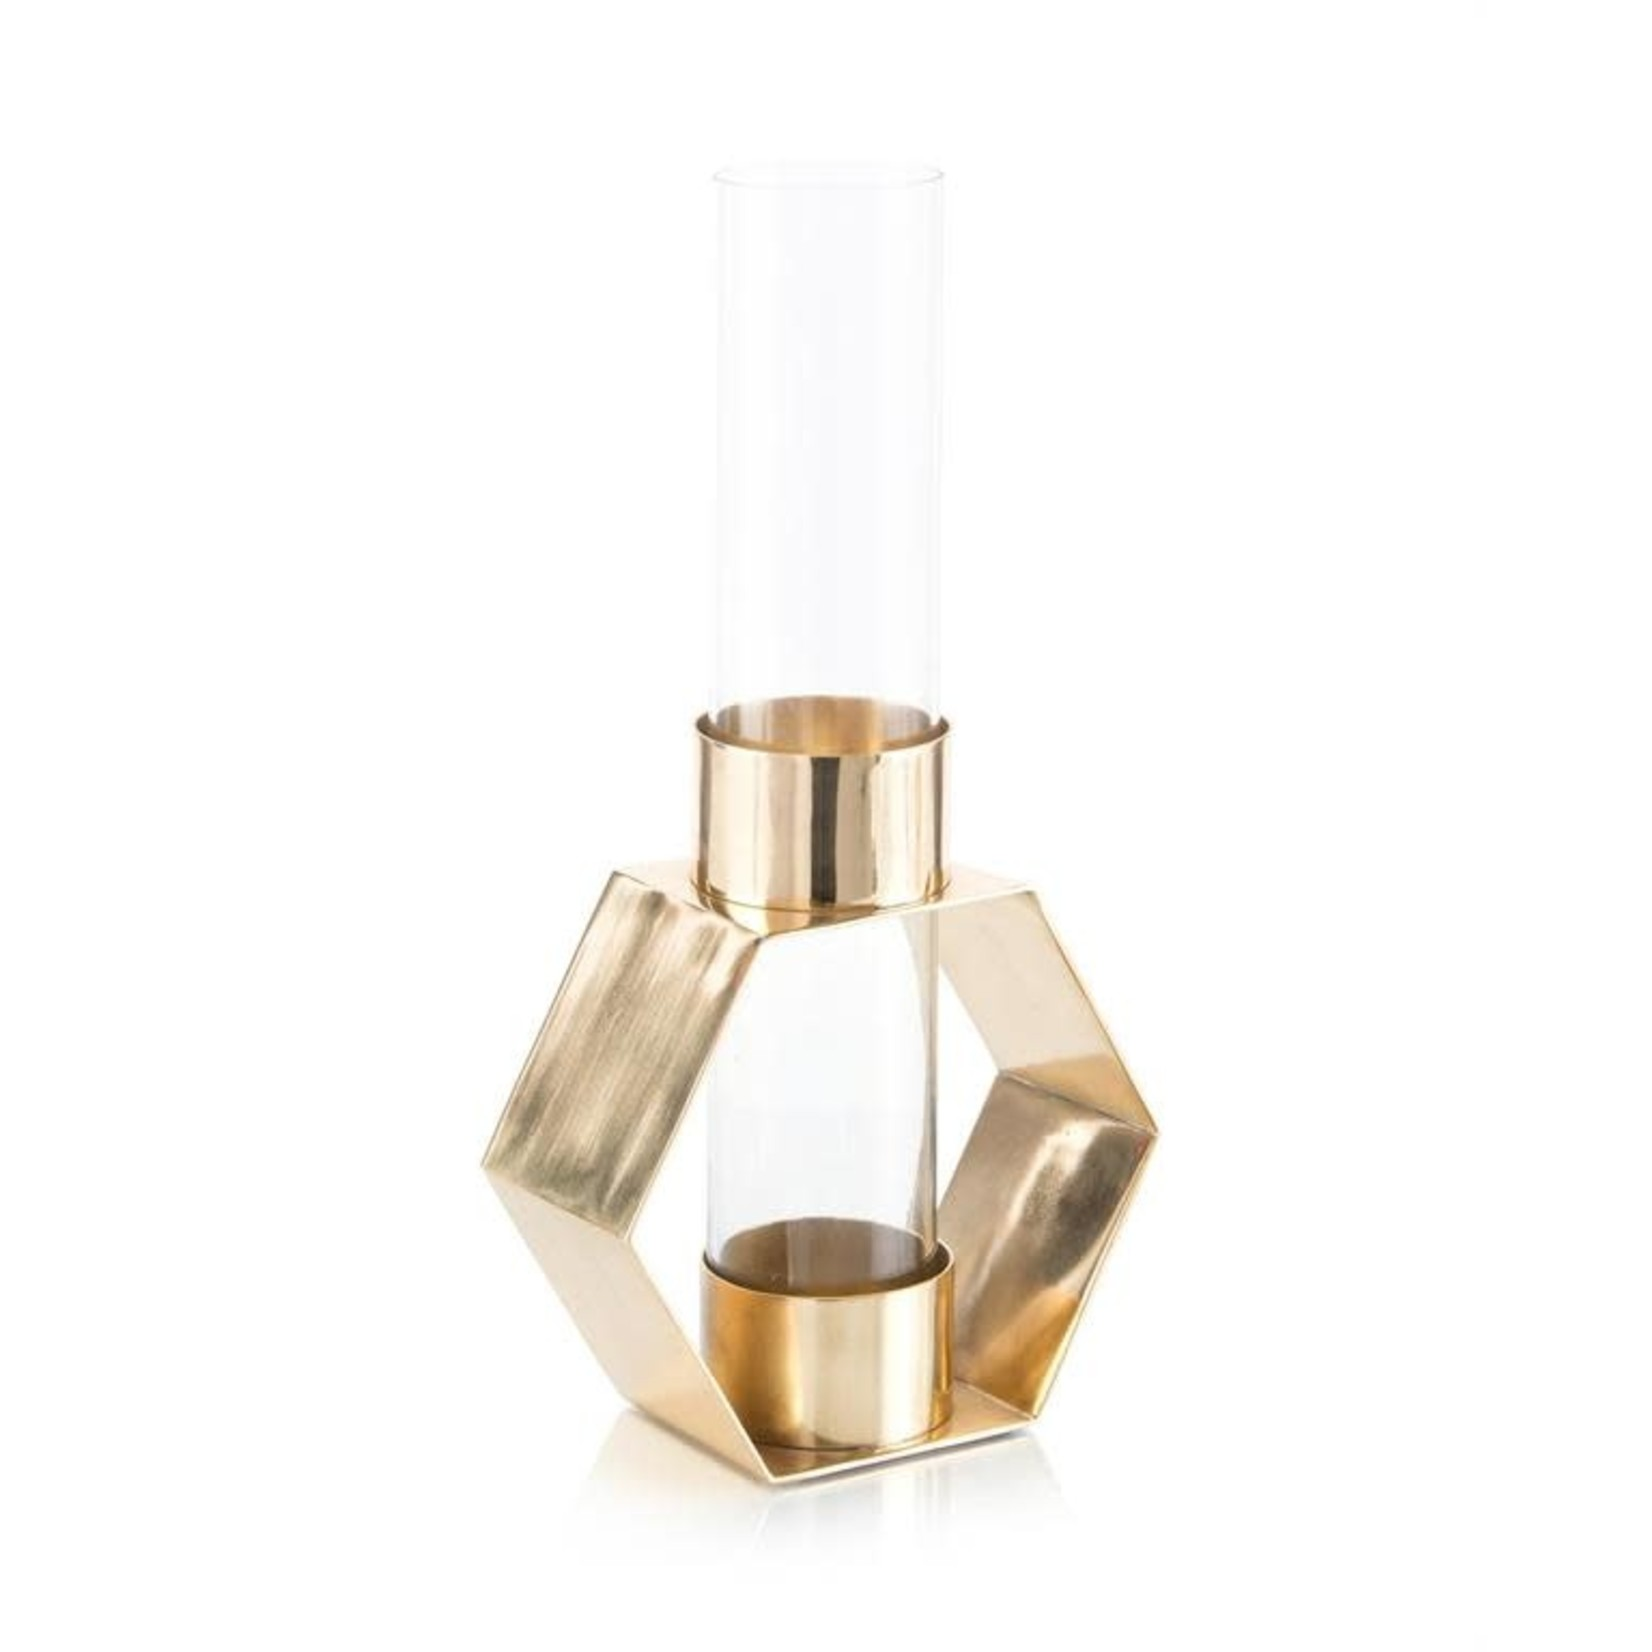 John Richard Penta Brass and Glass Vase